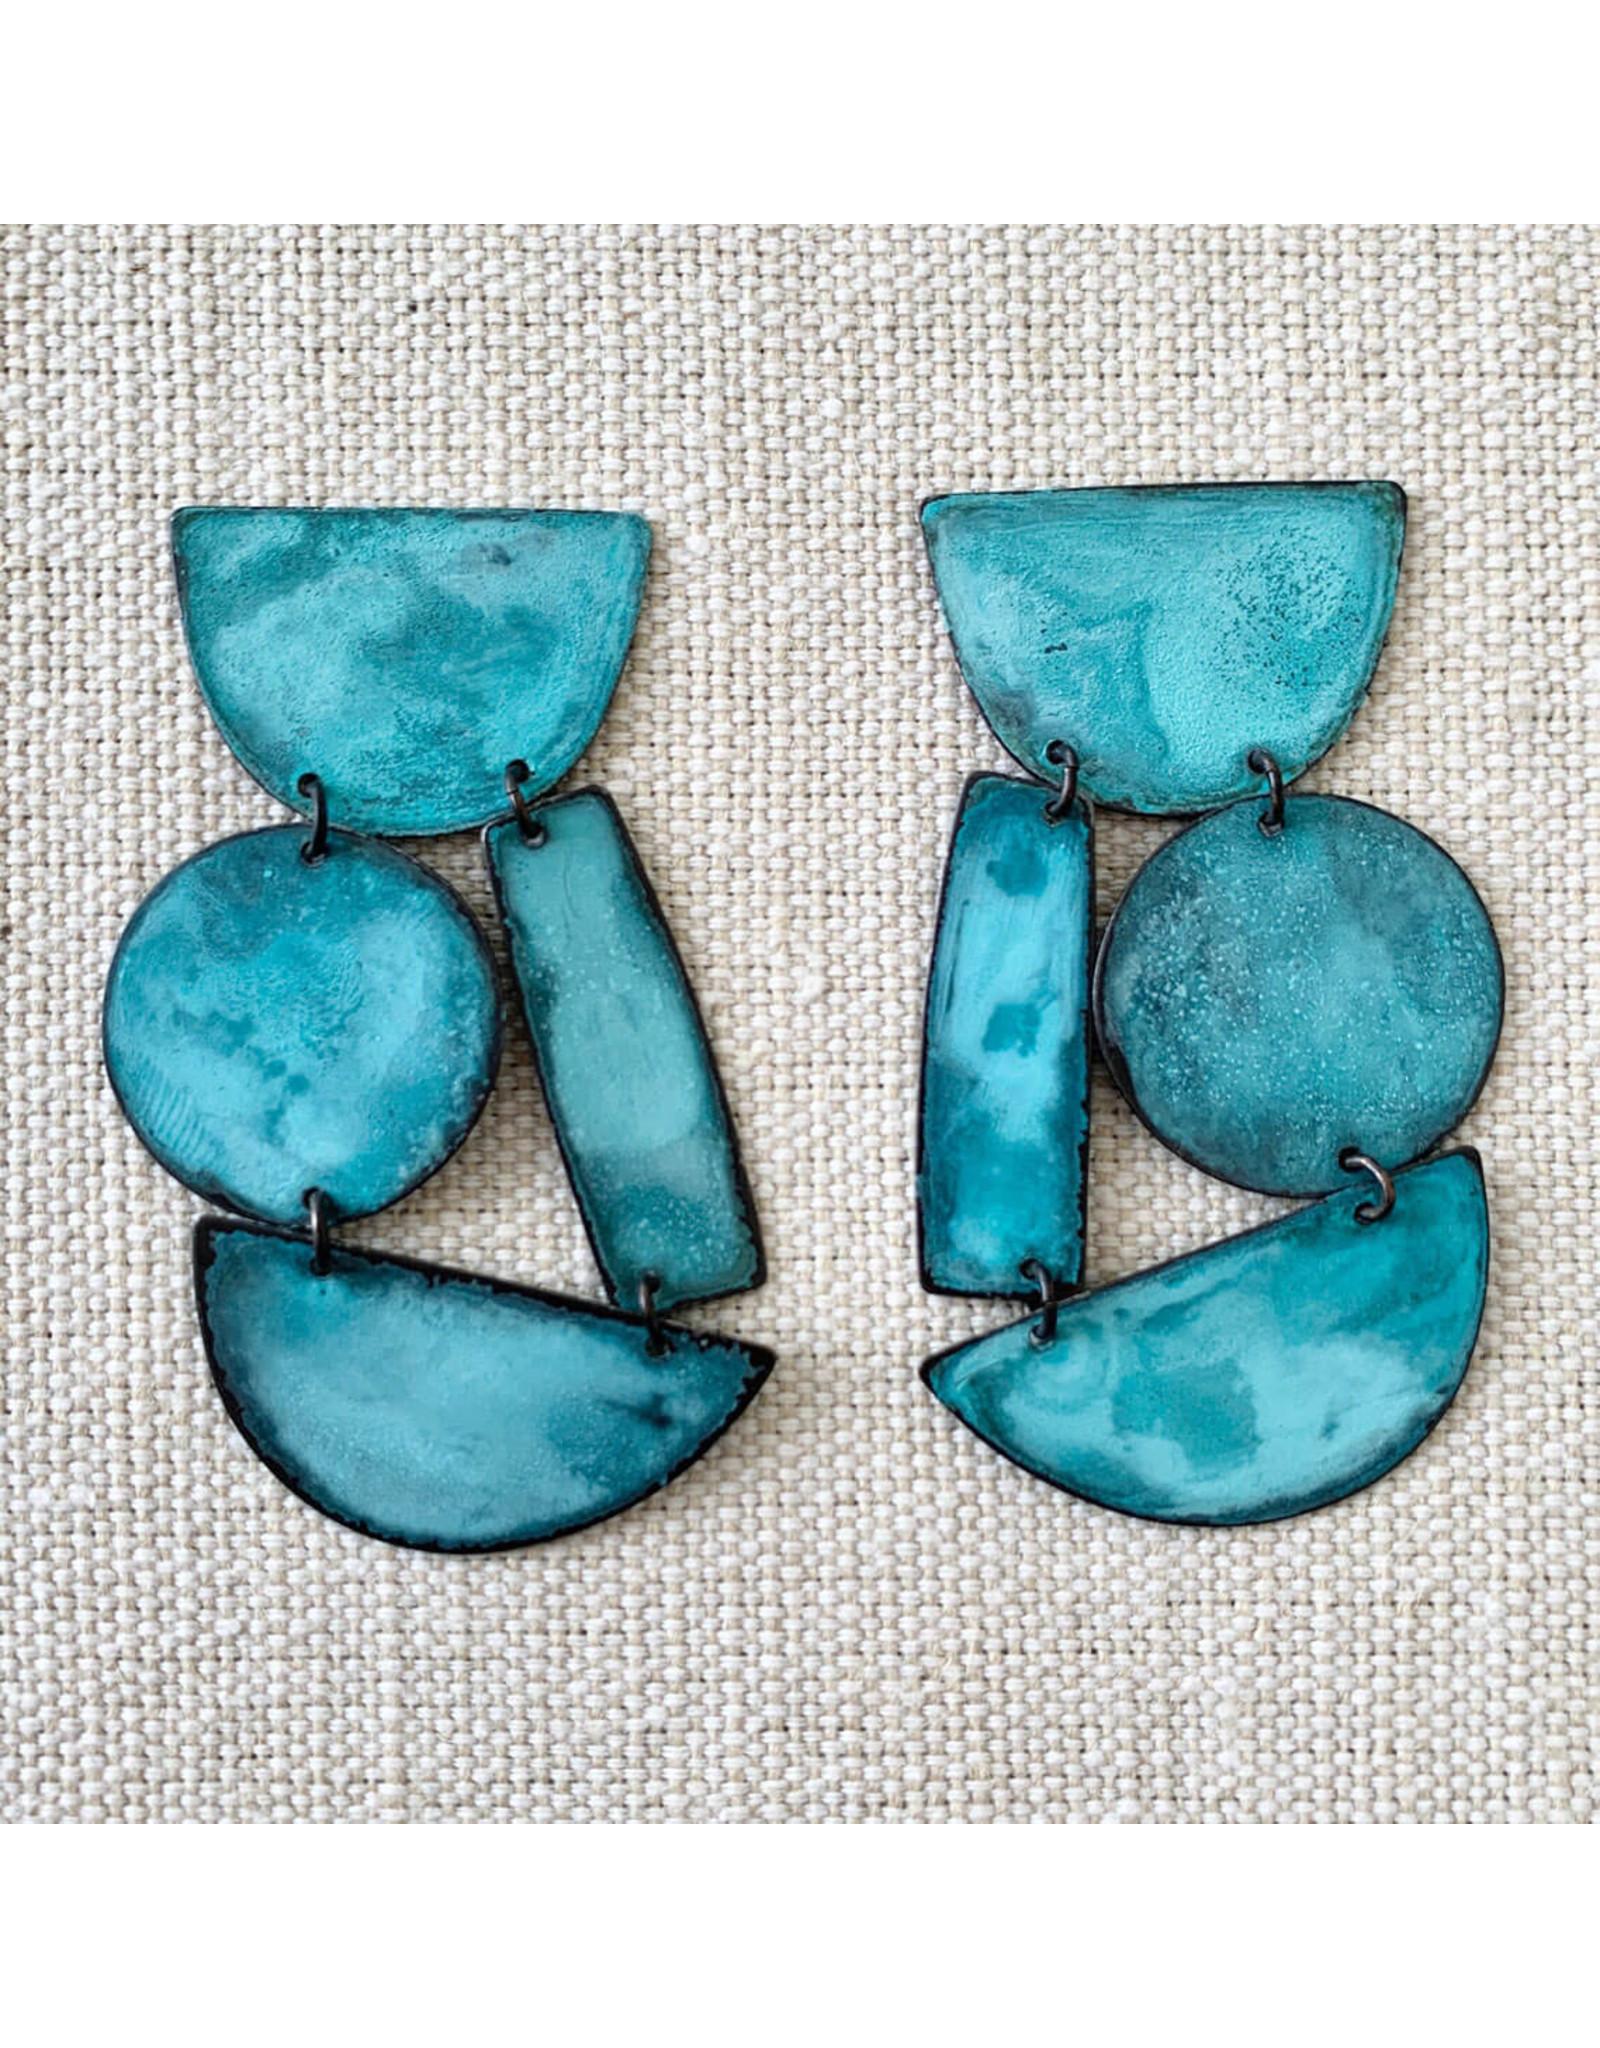 annie costello brown masha earrings cyan patina brass